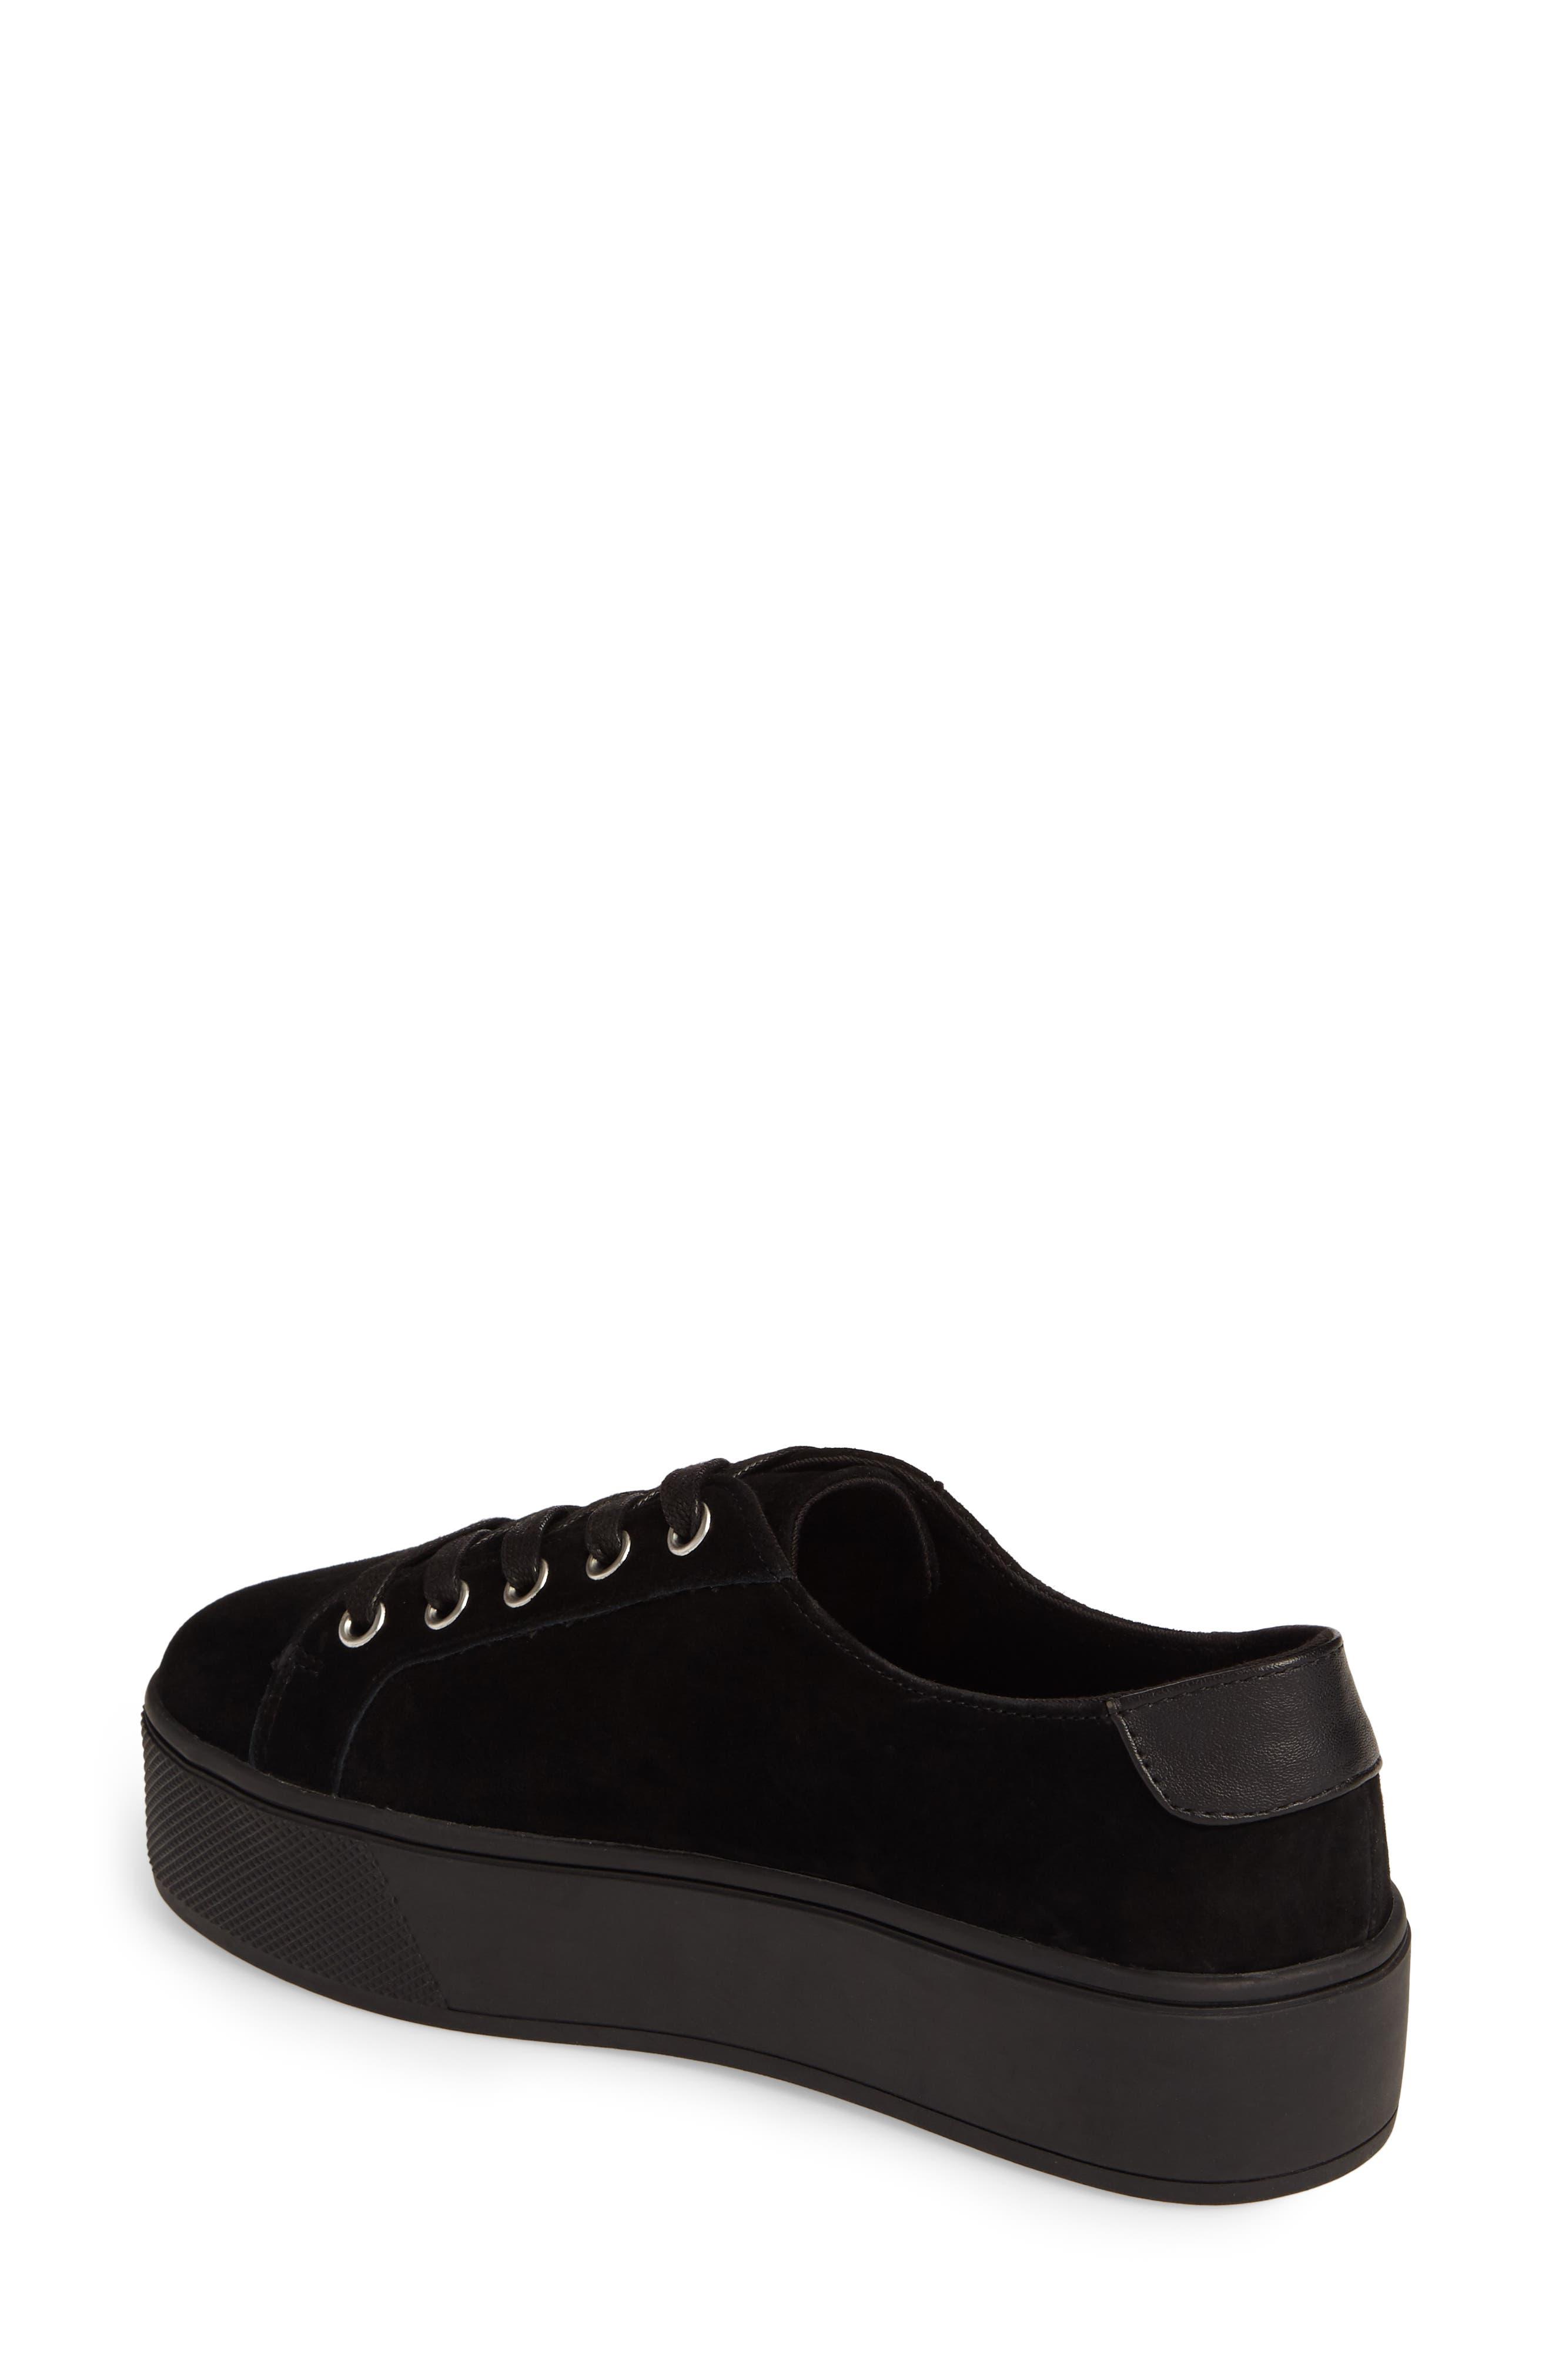 Felecia Platform Sneaker,                             Alternate thumbnail 2, color,                             Black Suede